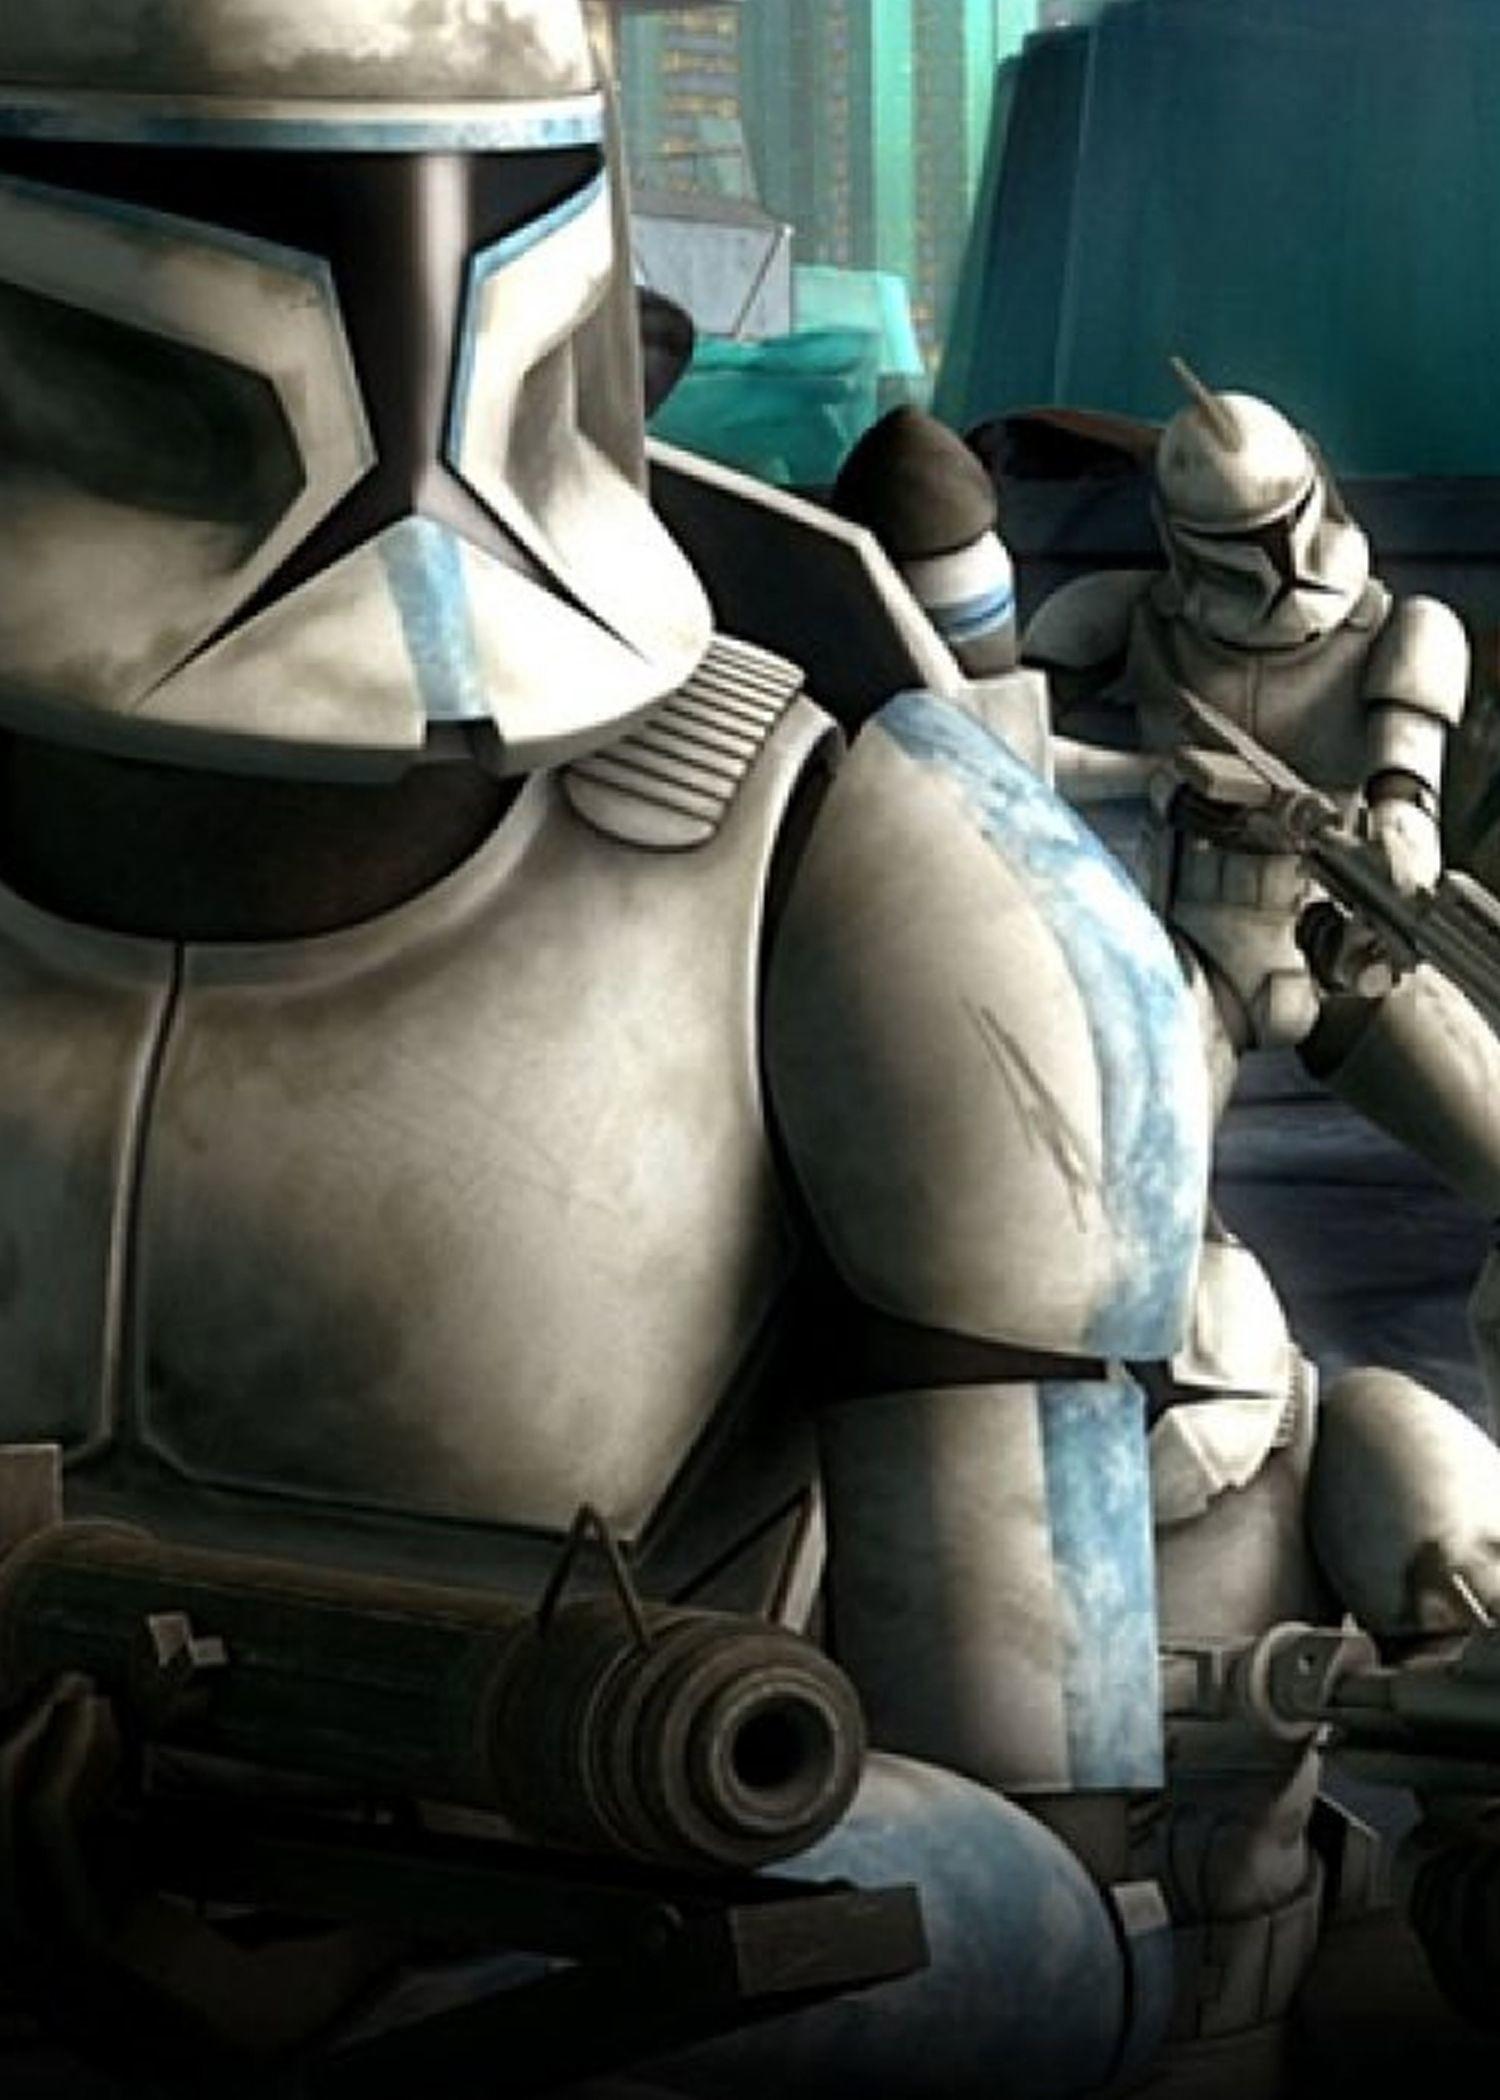 Star Wars Clone Trooper Wallpaper (67+ images)